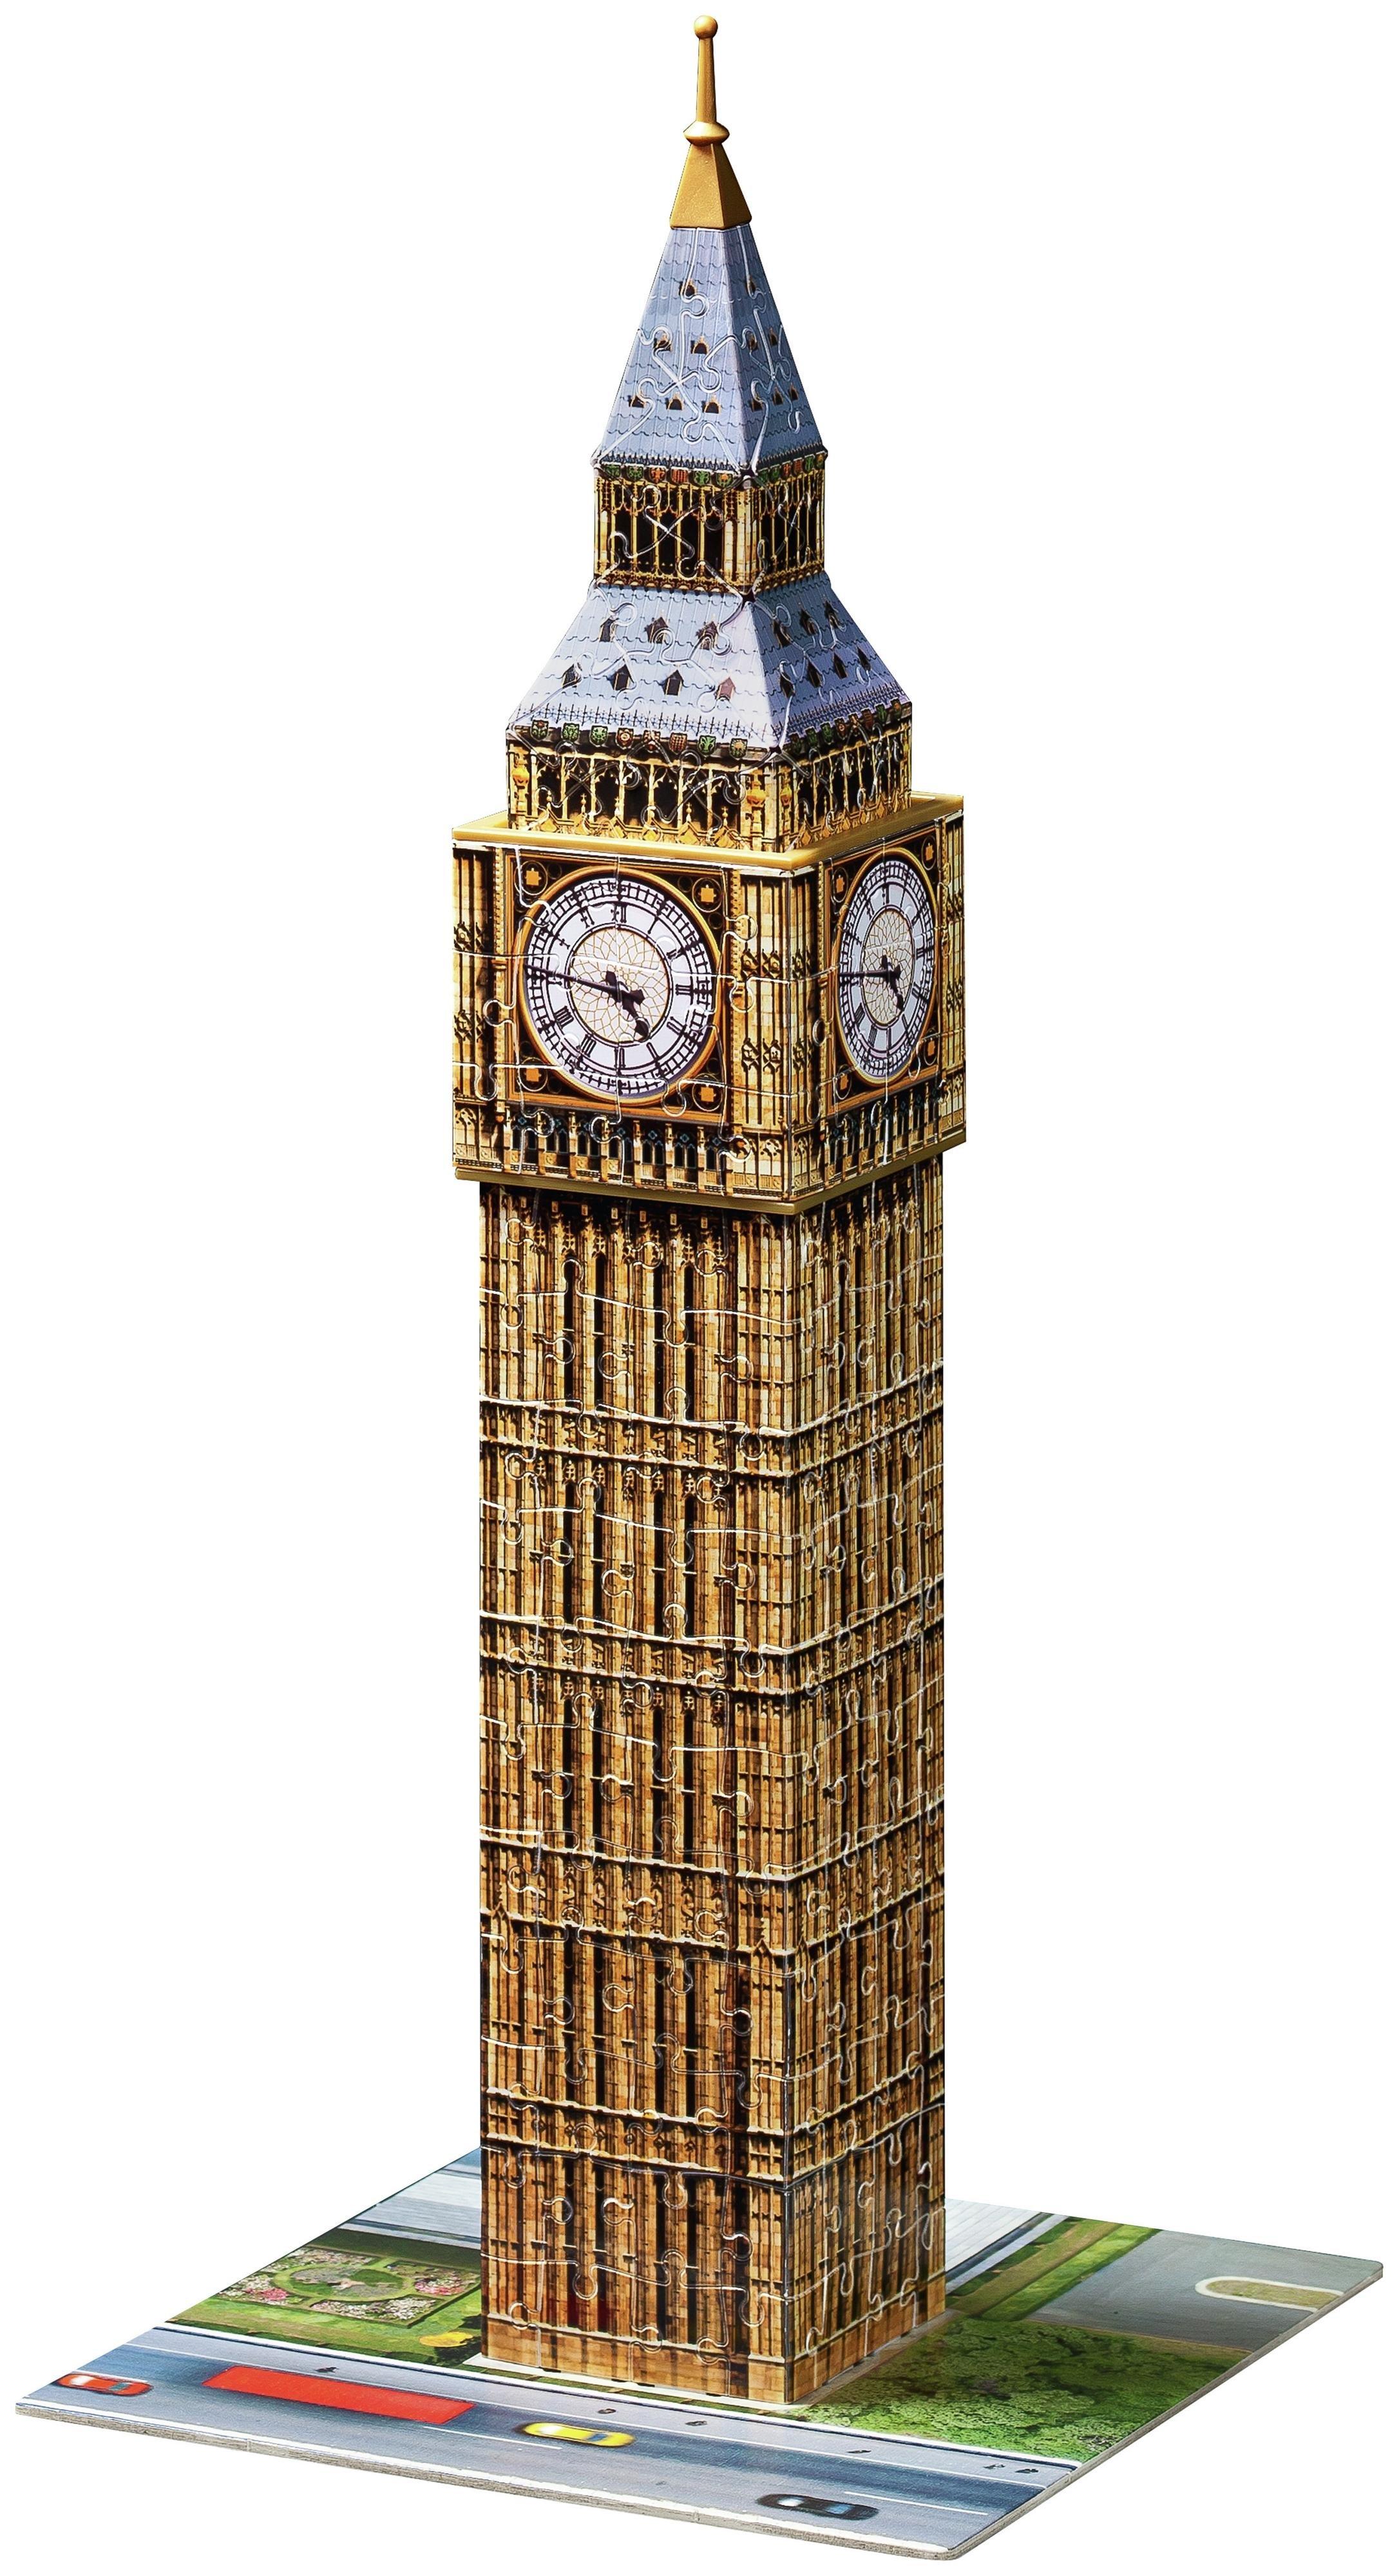 Ravensburger Big Ben 216 Piece 3D Jigsaw Puzzle